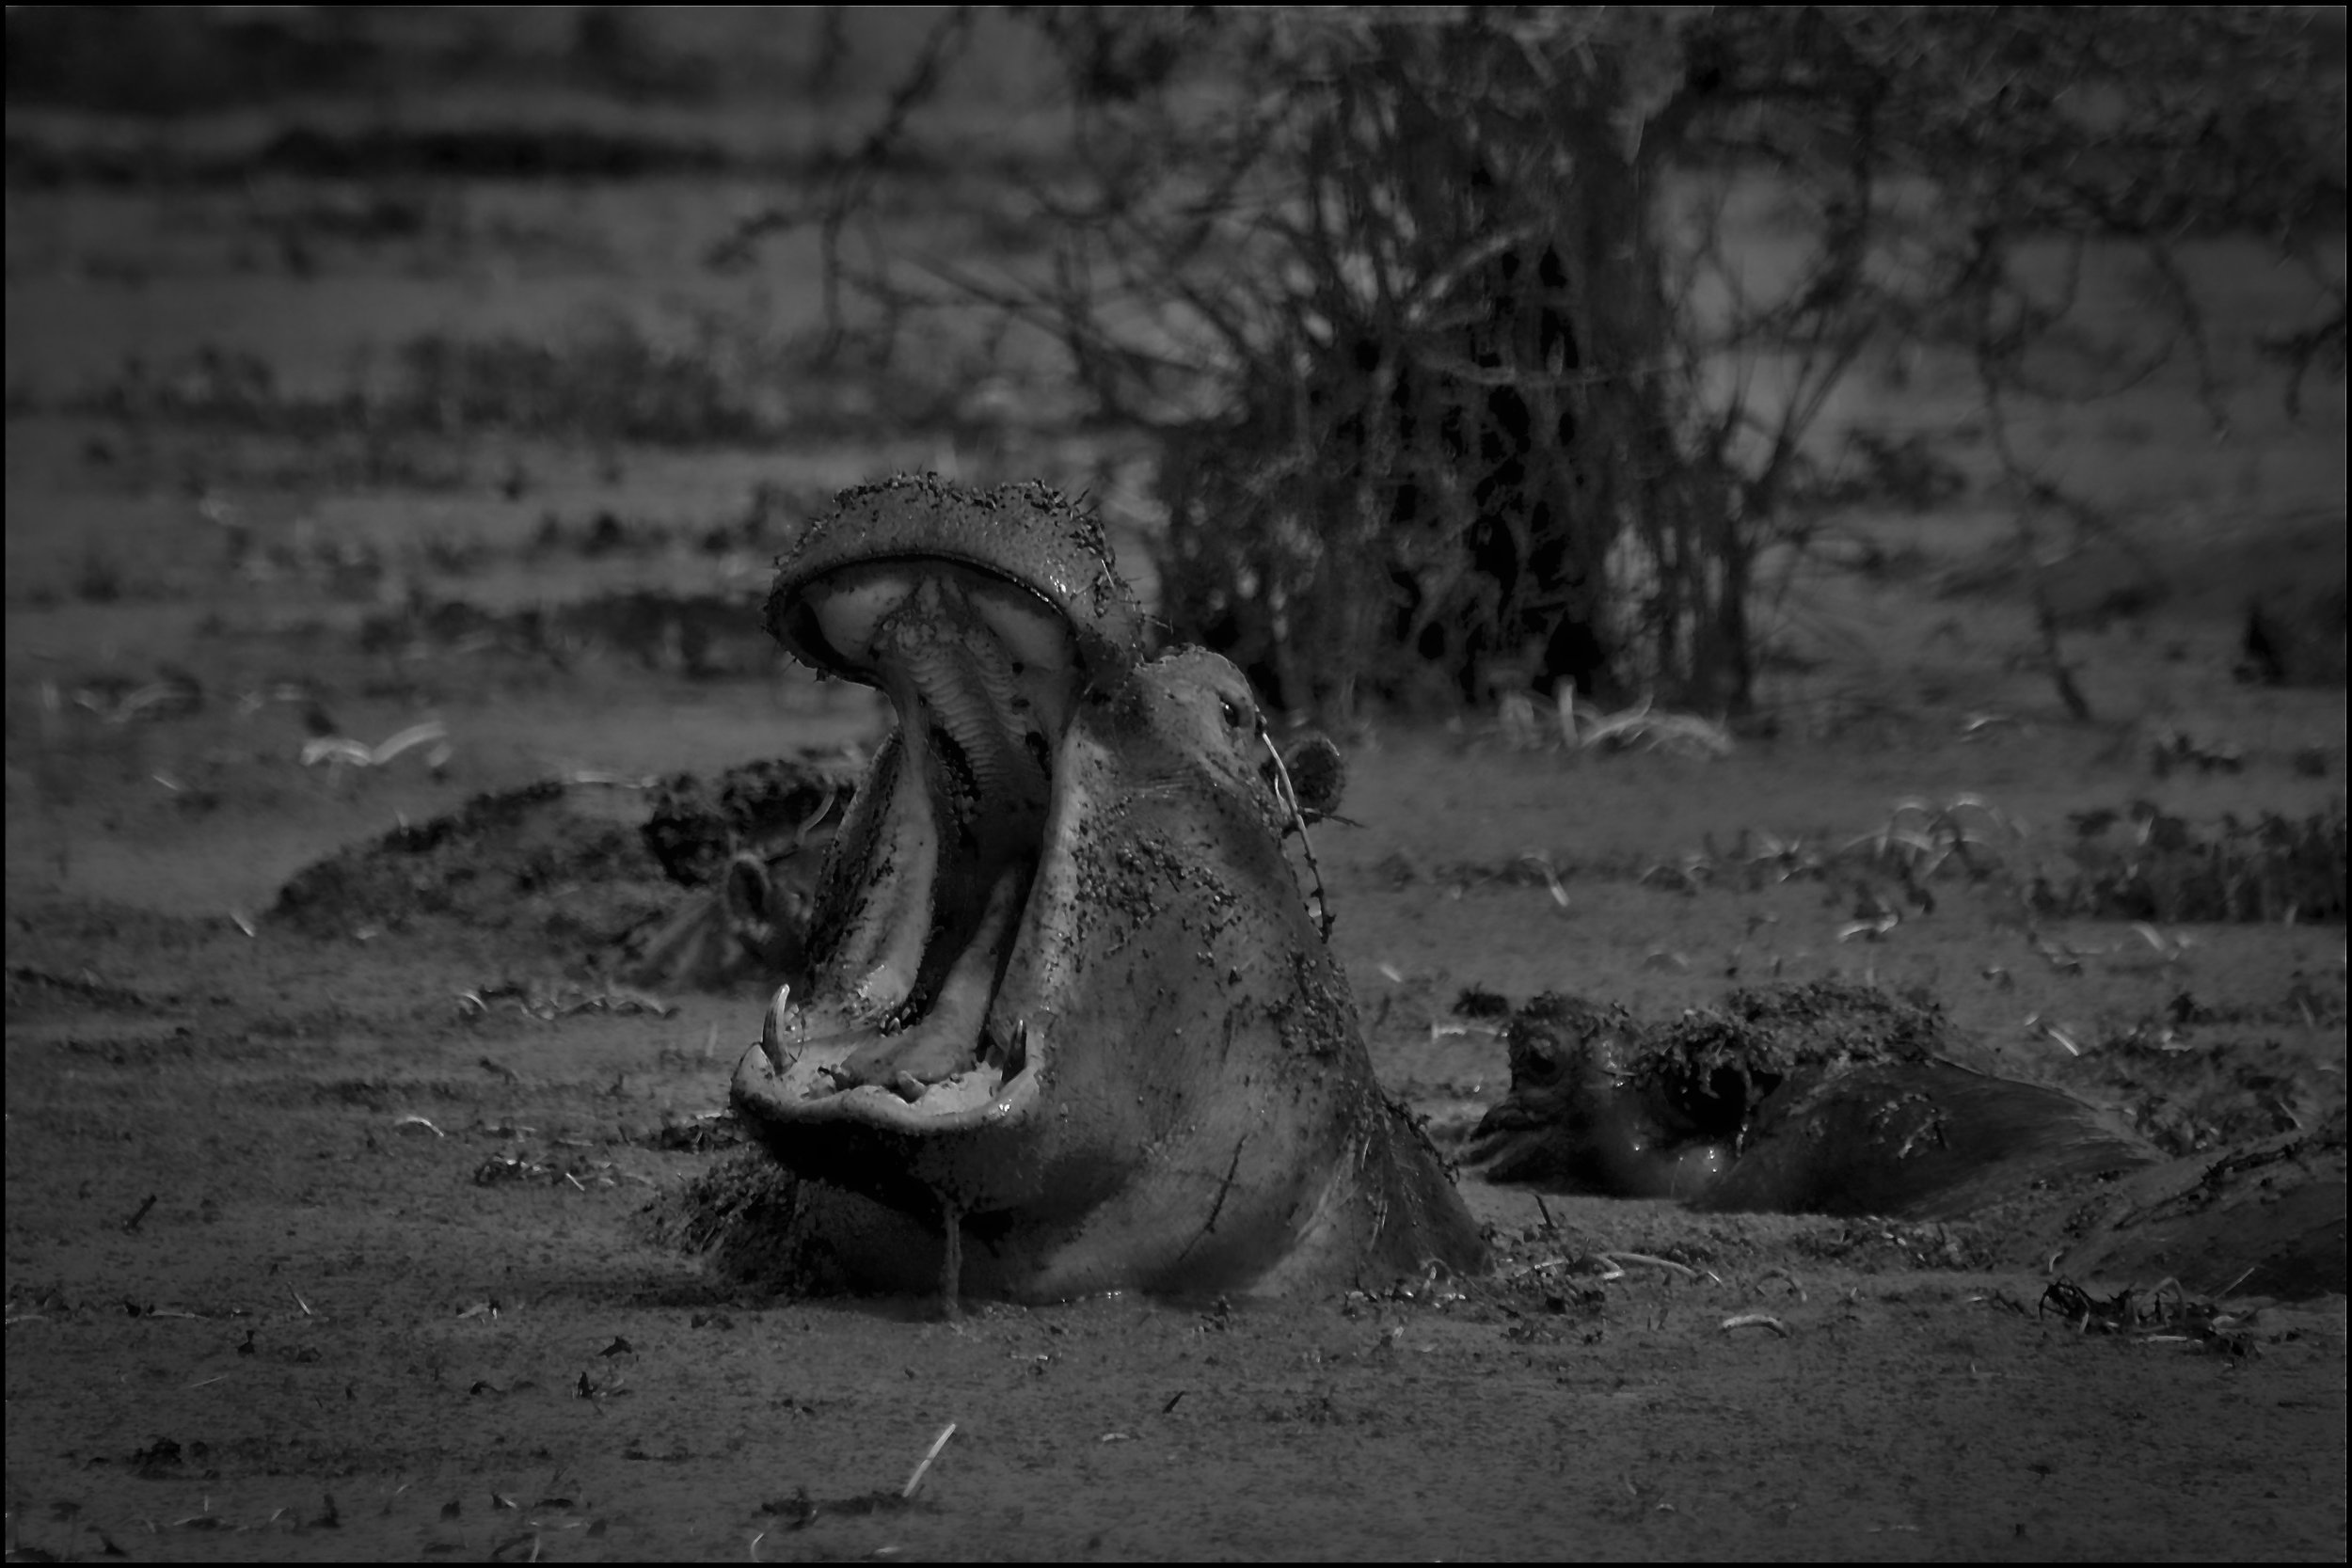 Hippo, Nogorongoro Crater, Tanzania.